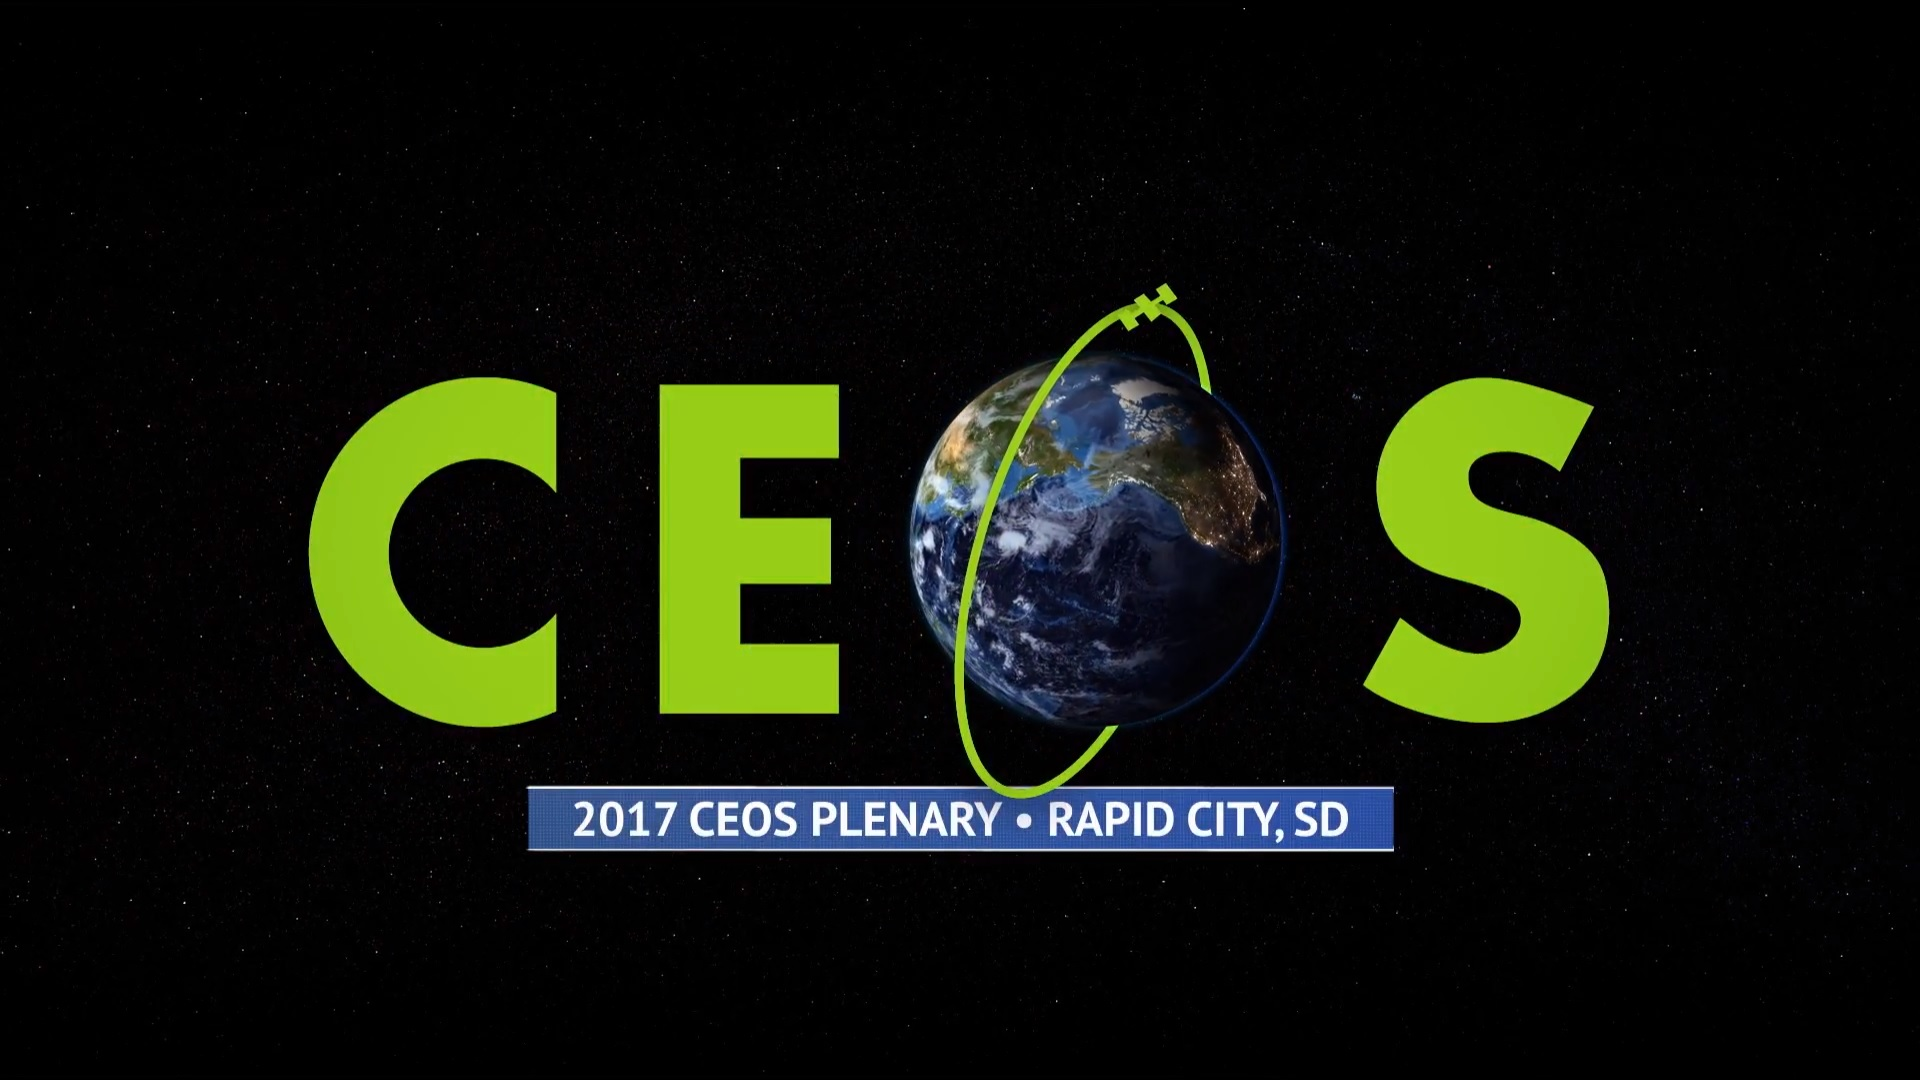 CEOS. 2017 CEOS Plenary in Rapid City, South Dakota